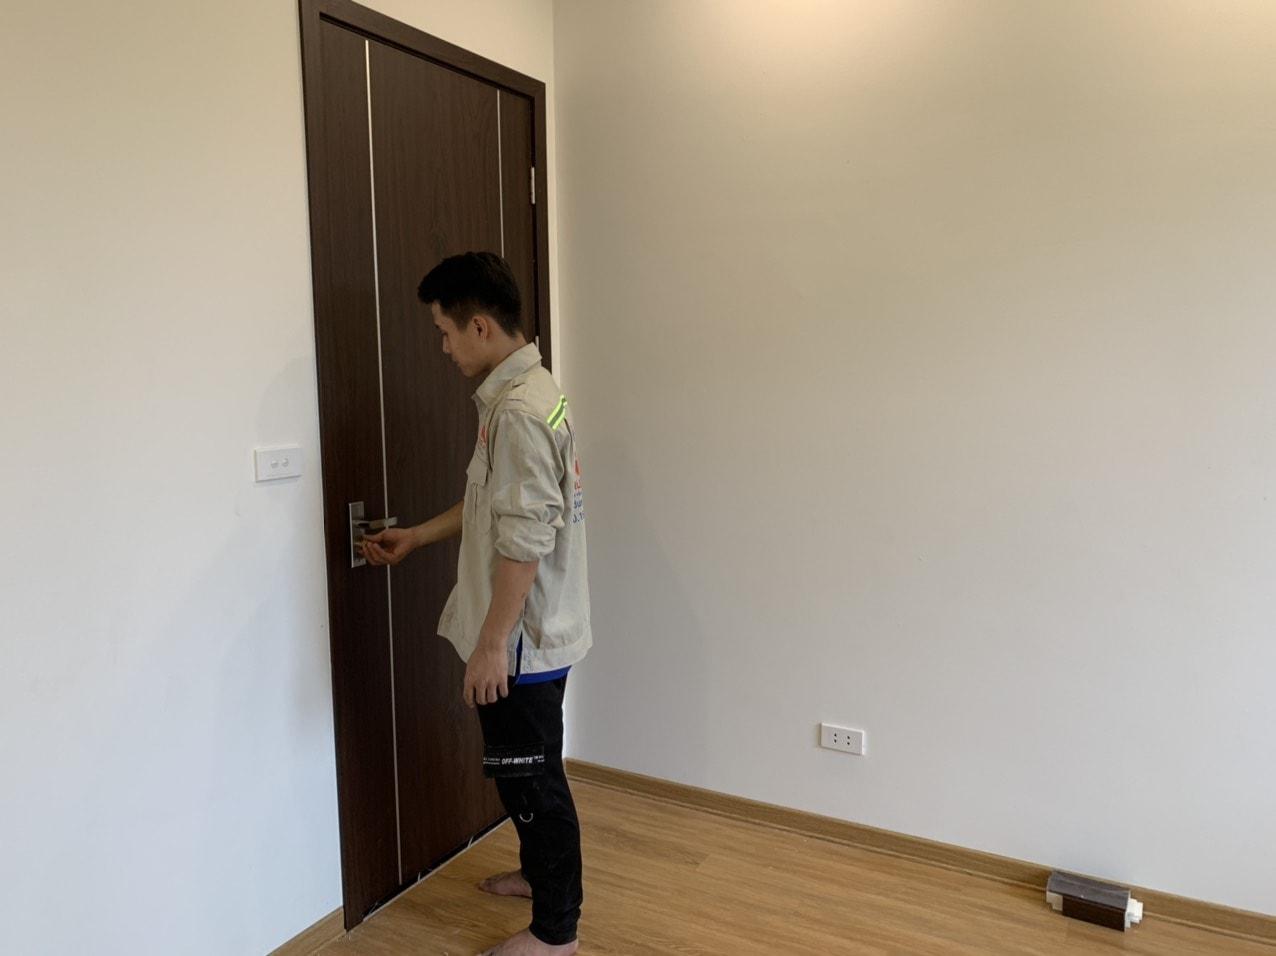 Báo giá cửa nhựa Composite vân gỗ 2020 [ Trường Sinh Door ]-4